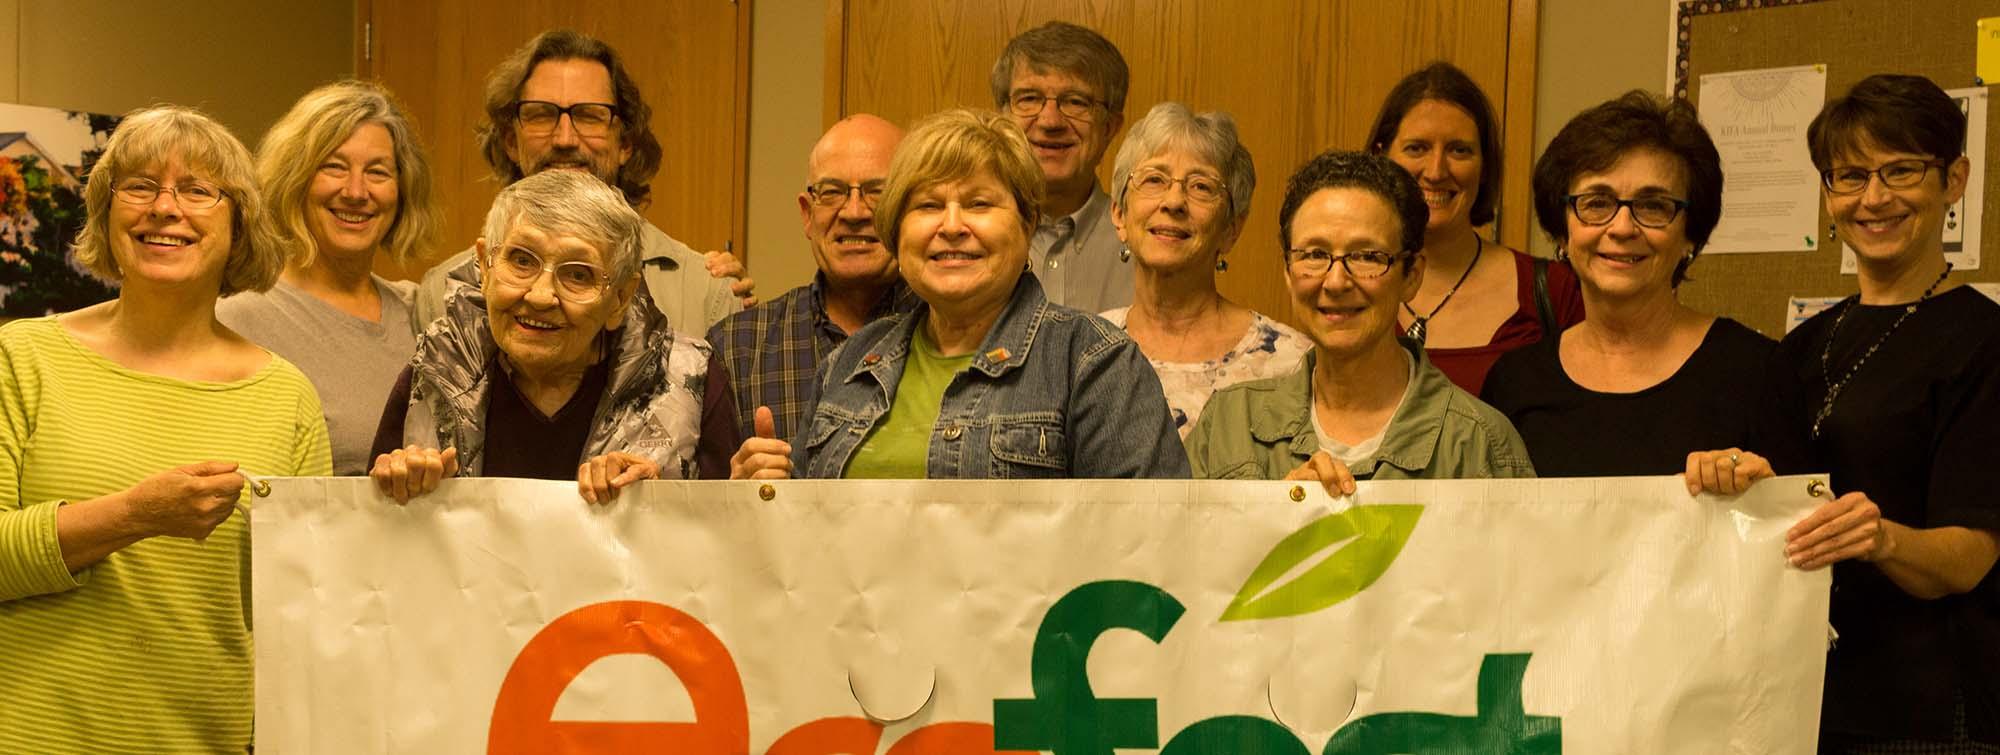 2017May11_EcoFest-Volunteer-Group_11-2000x755